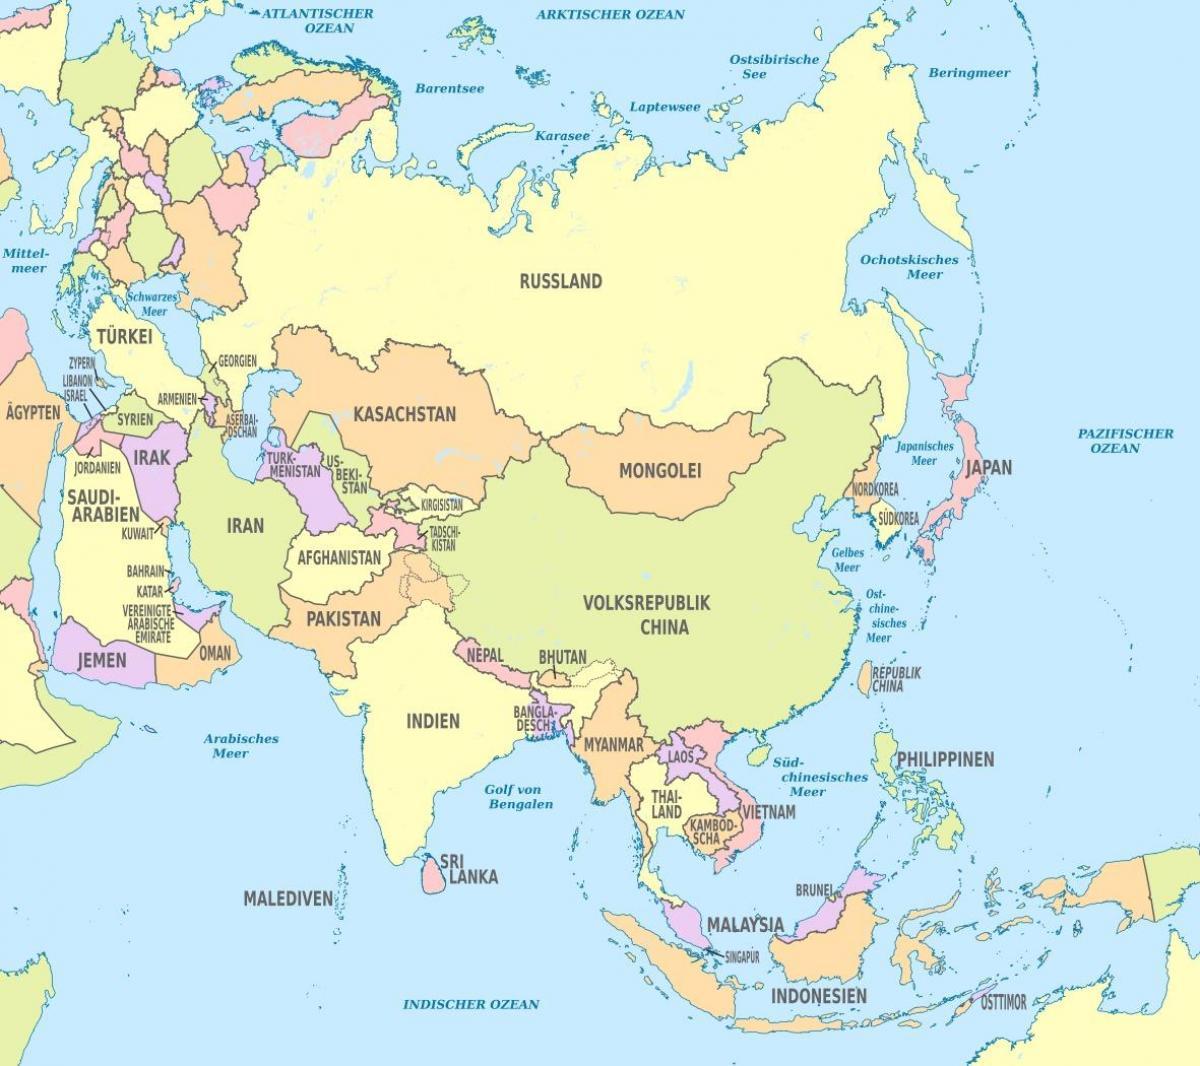 Search hotels near Racing Dakart Kart Track in Asia